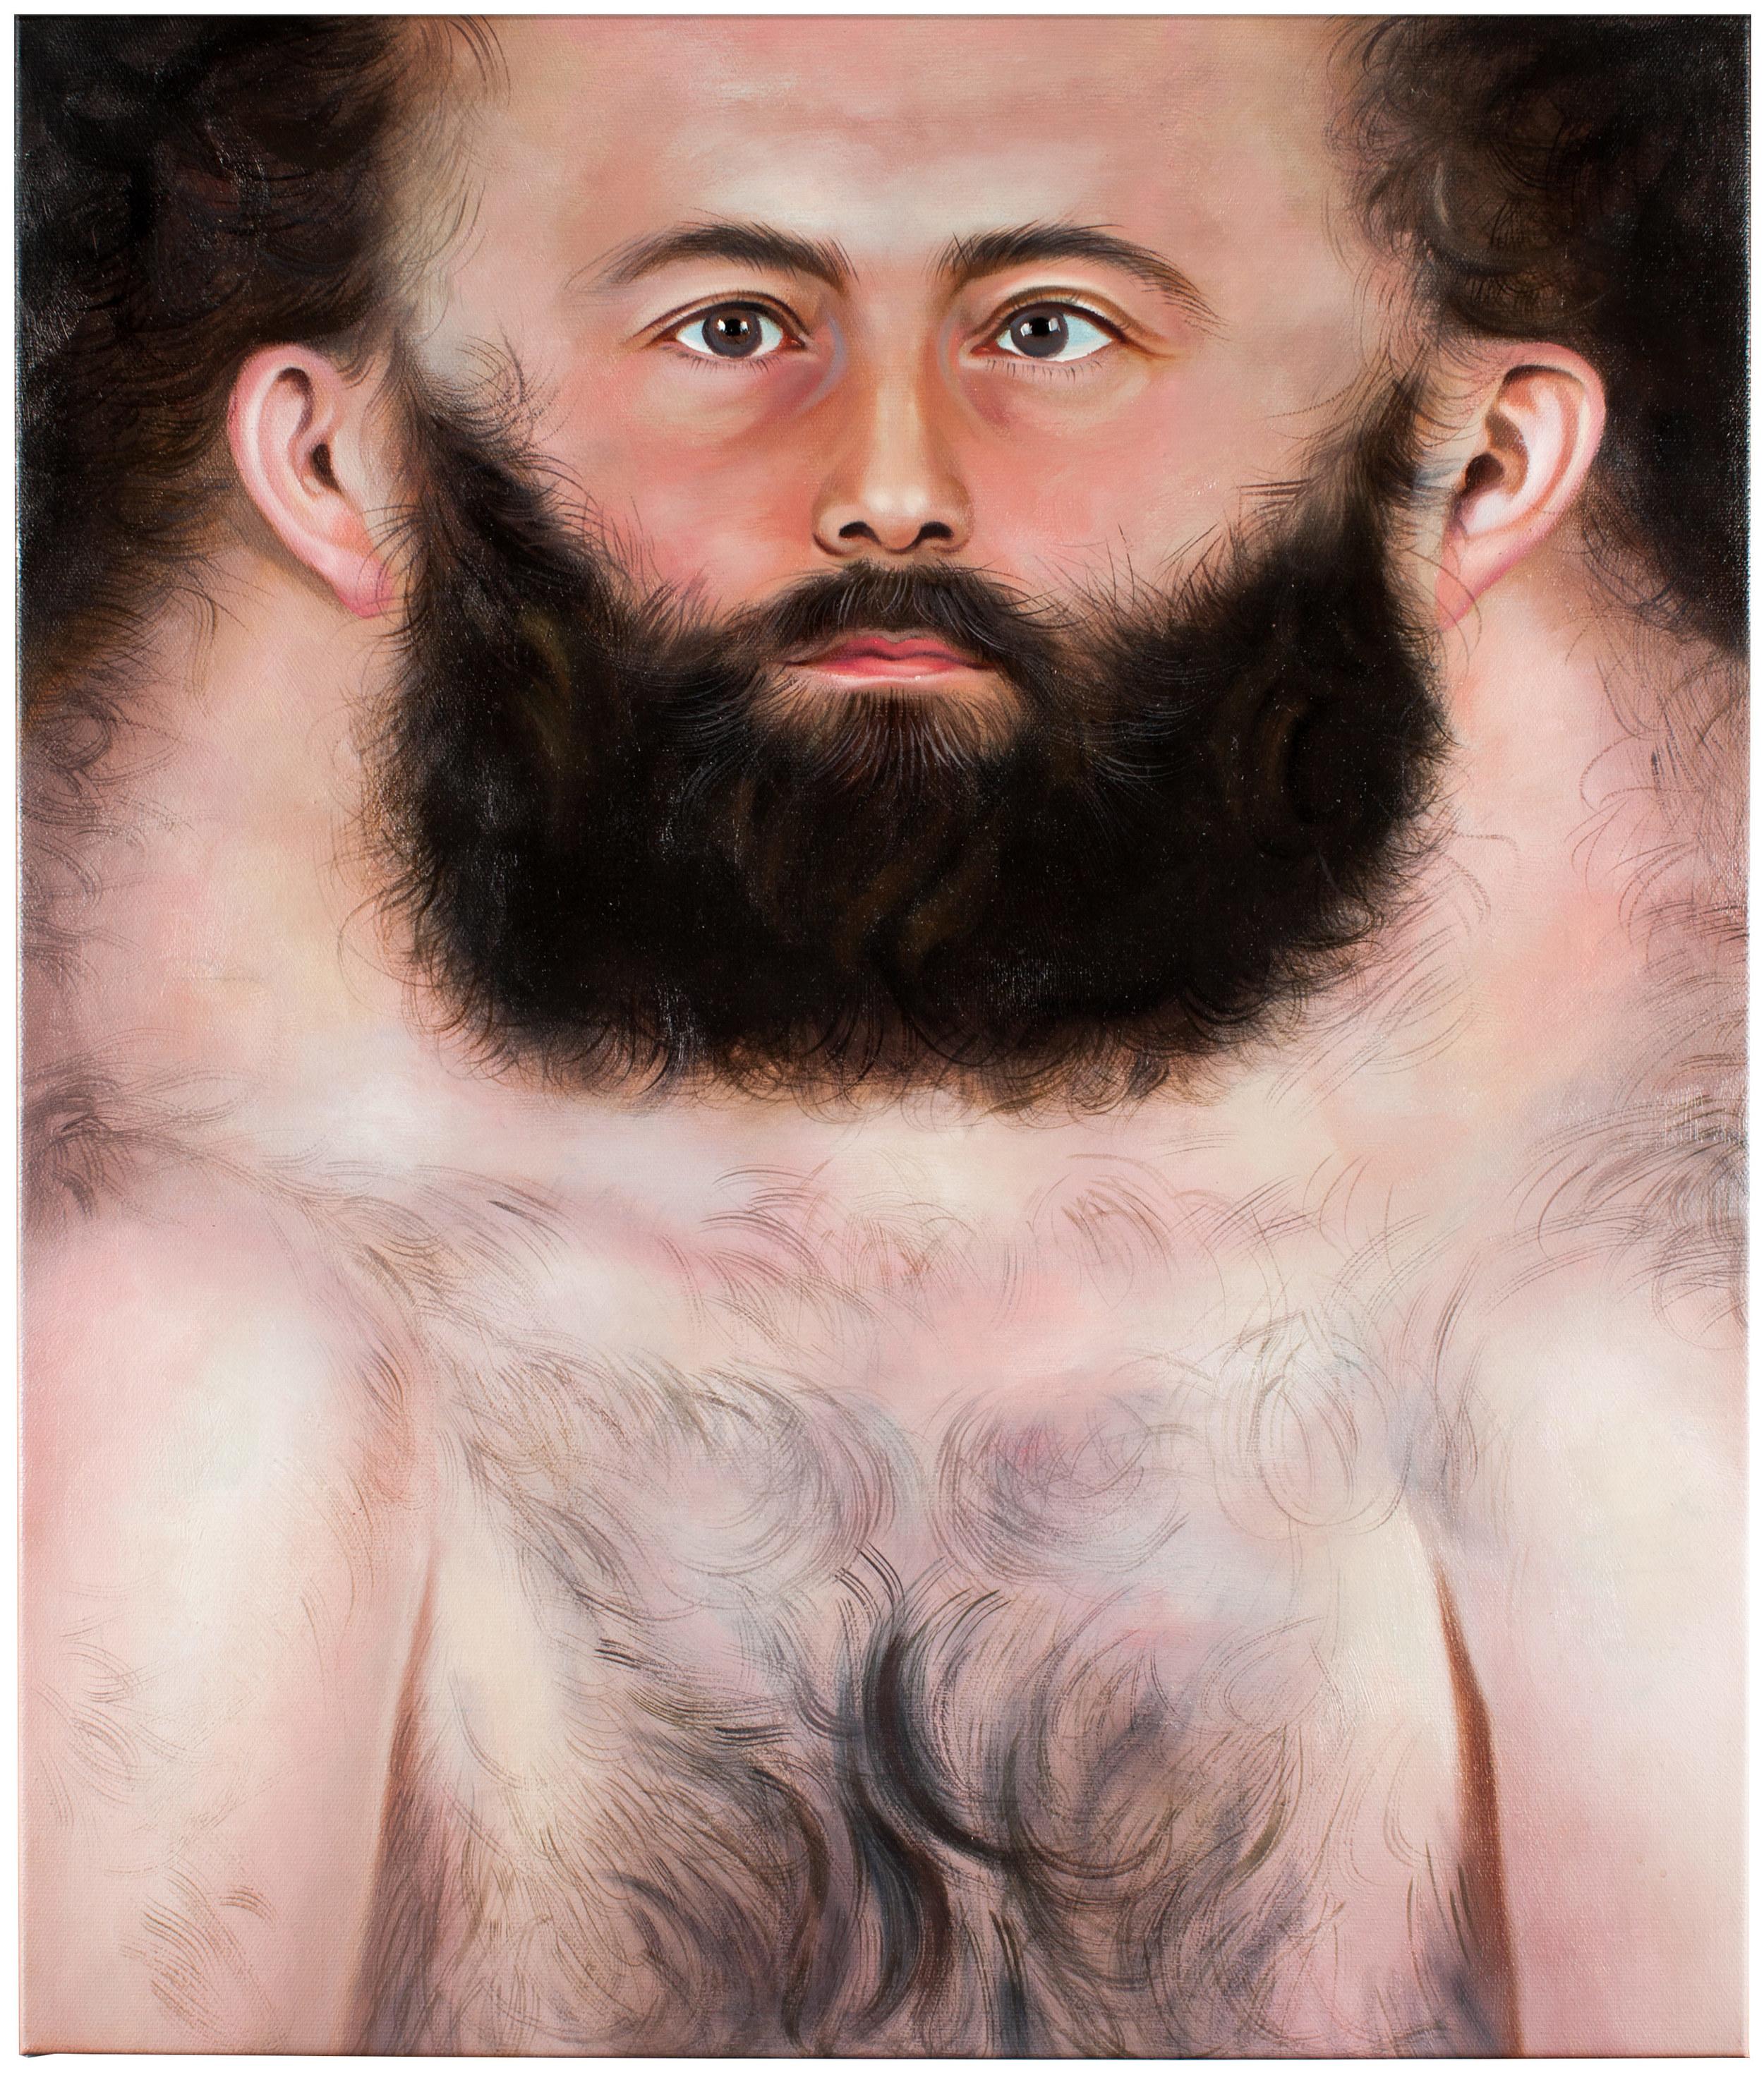 Alexander Tarrant   Quake Skin   Oil on Canvas 21 x 25 inches